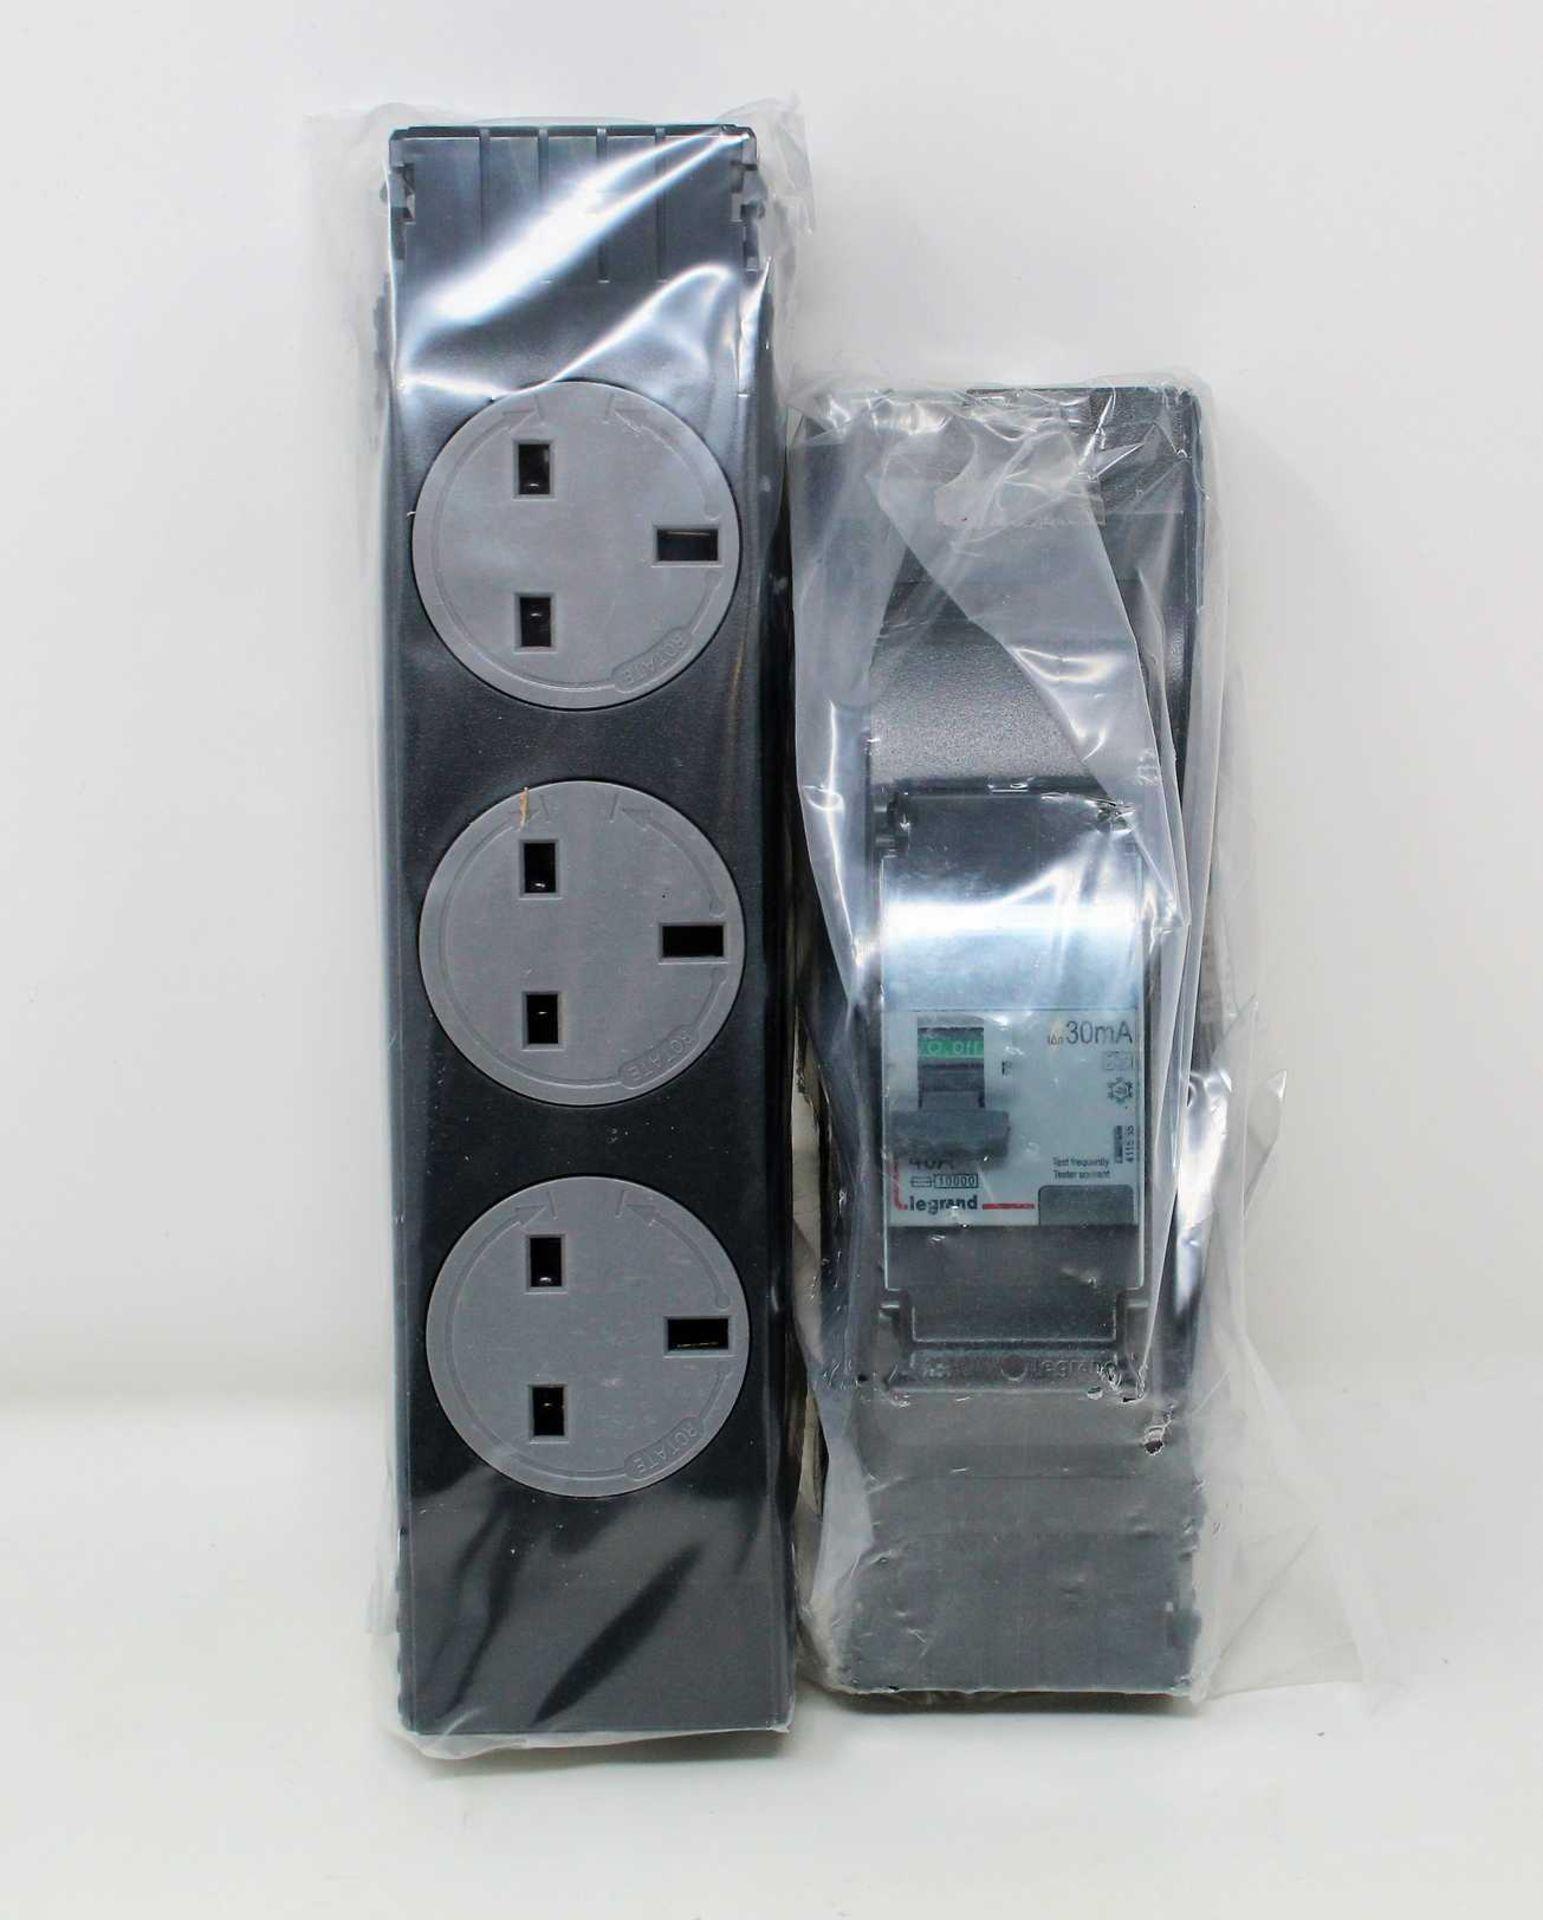 Twenty Electrak 3 Gang Rotatable Socket Modules (IAB503R) and six Electrak Protection Modules with